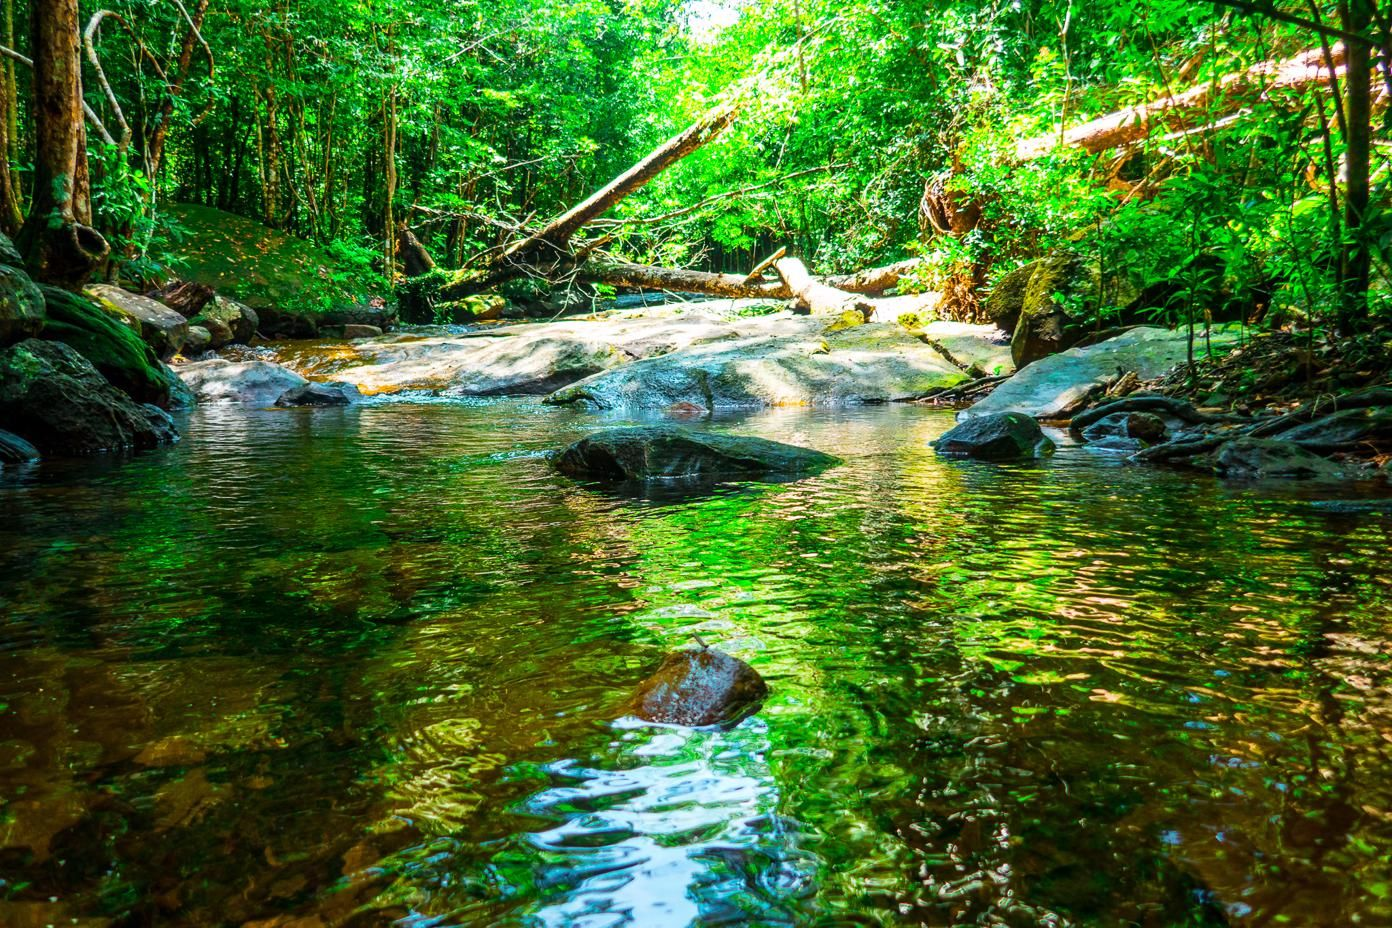 Phu Quoc Travel Guide - Suoi Tranh Waterfall